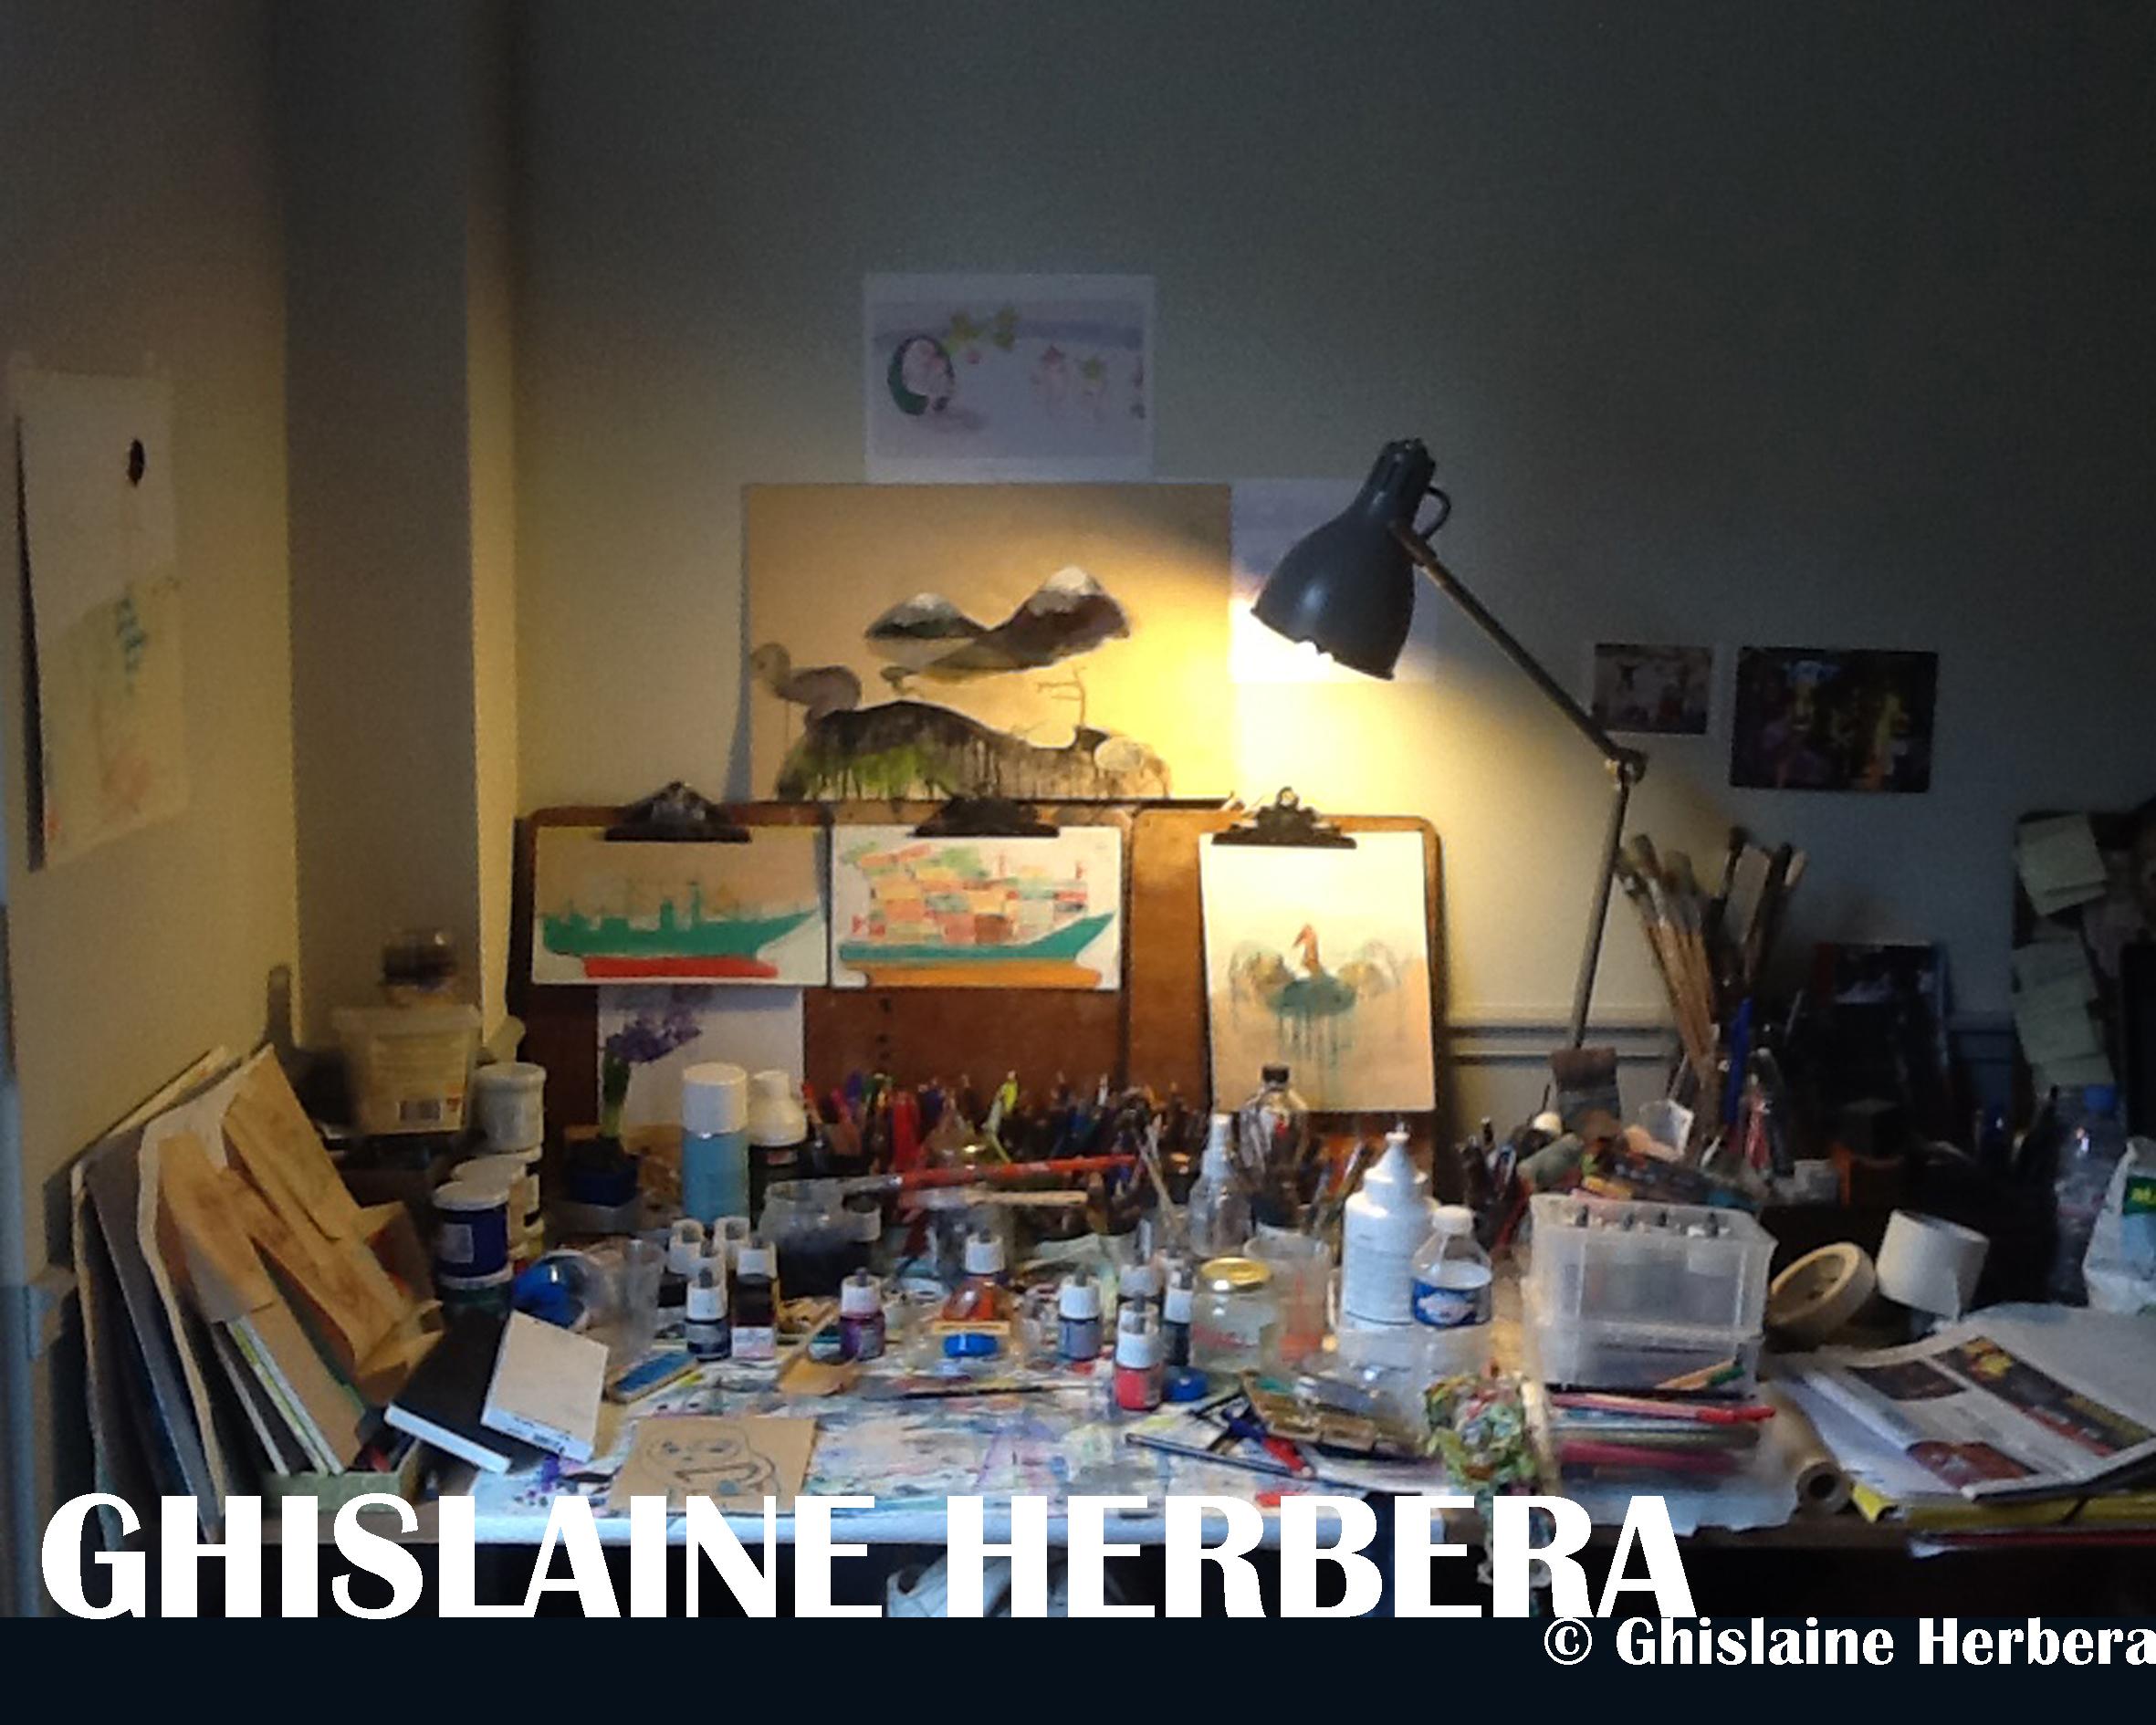 Ghislaine Herbera